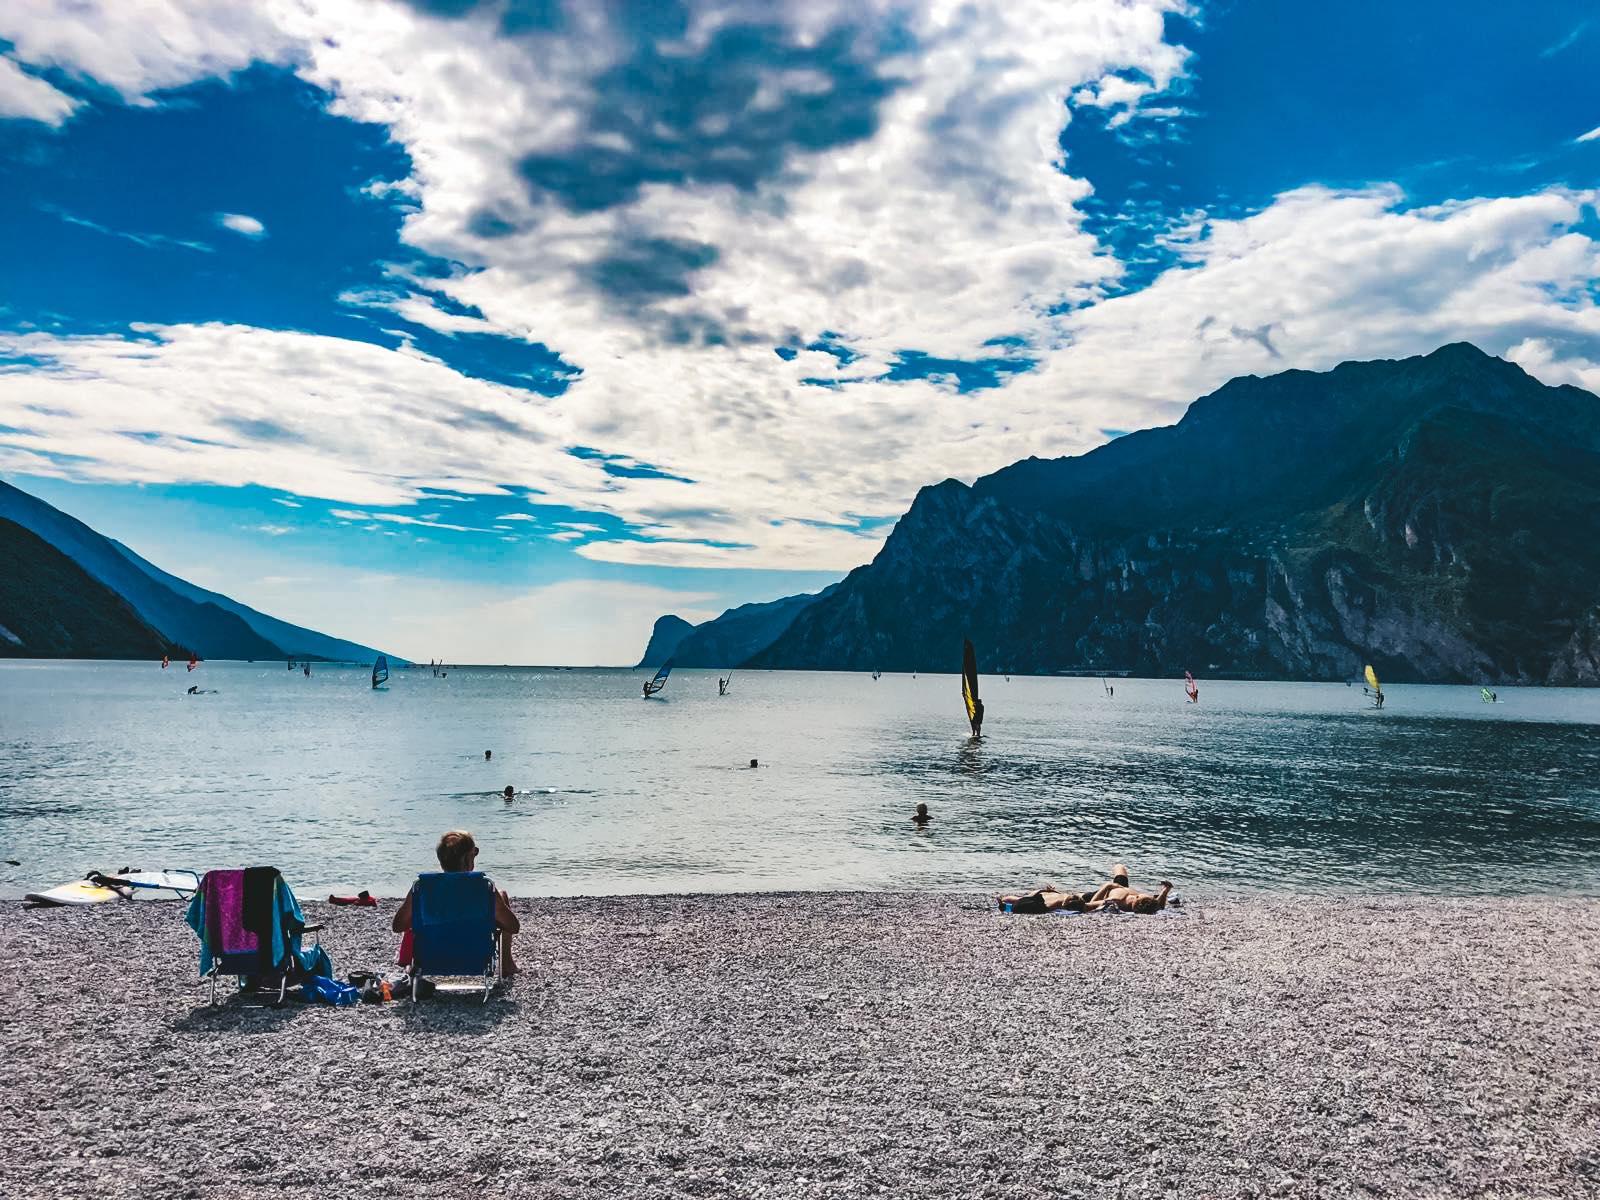 Life On The Road Day 131 Hello from Lago di Garda, ITALY19.jpg